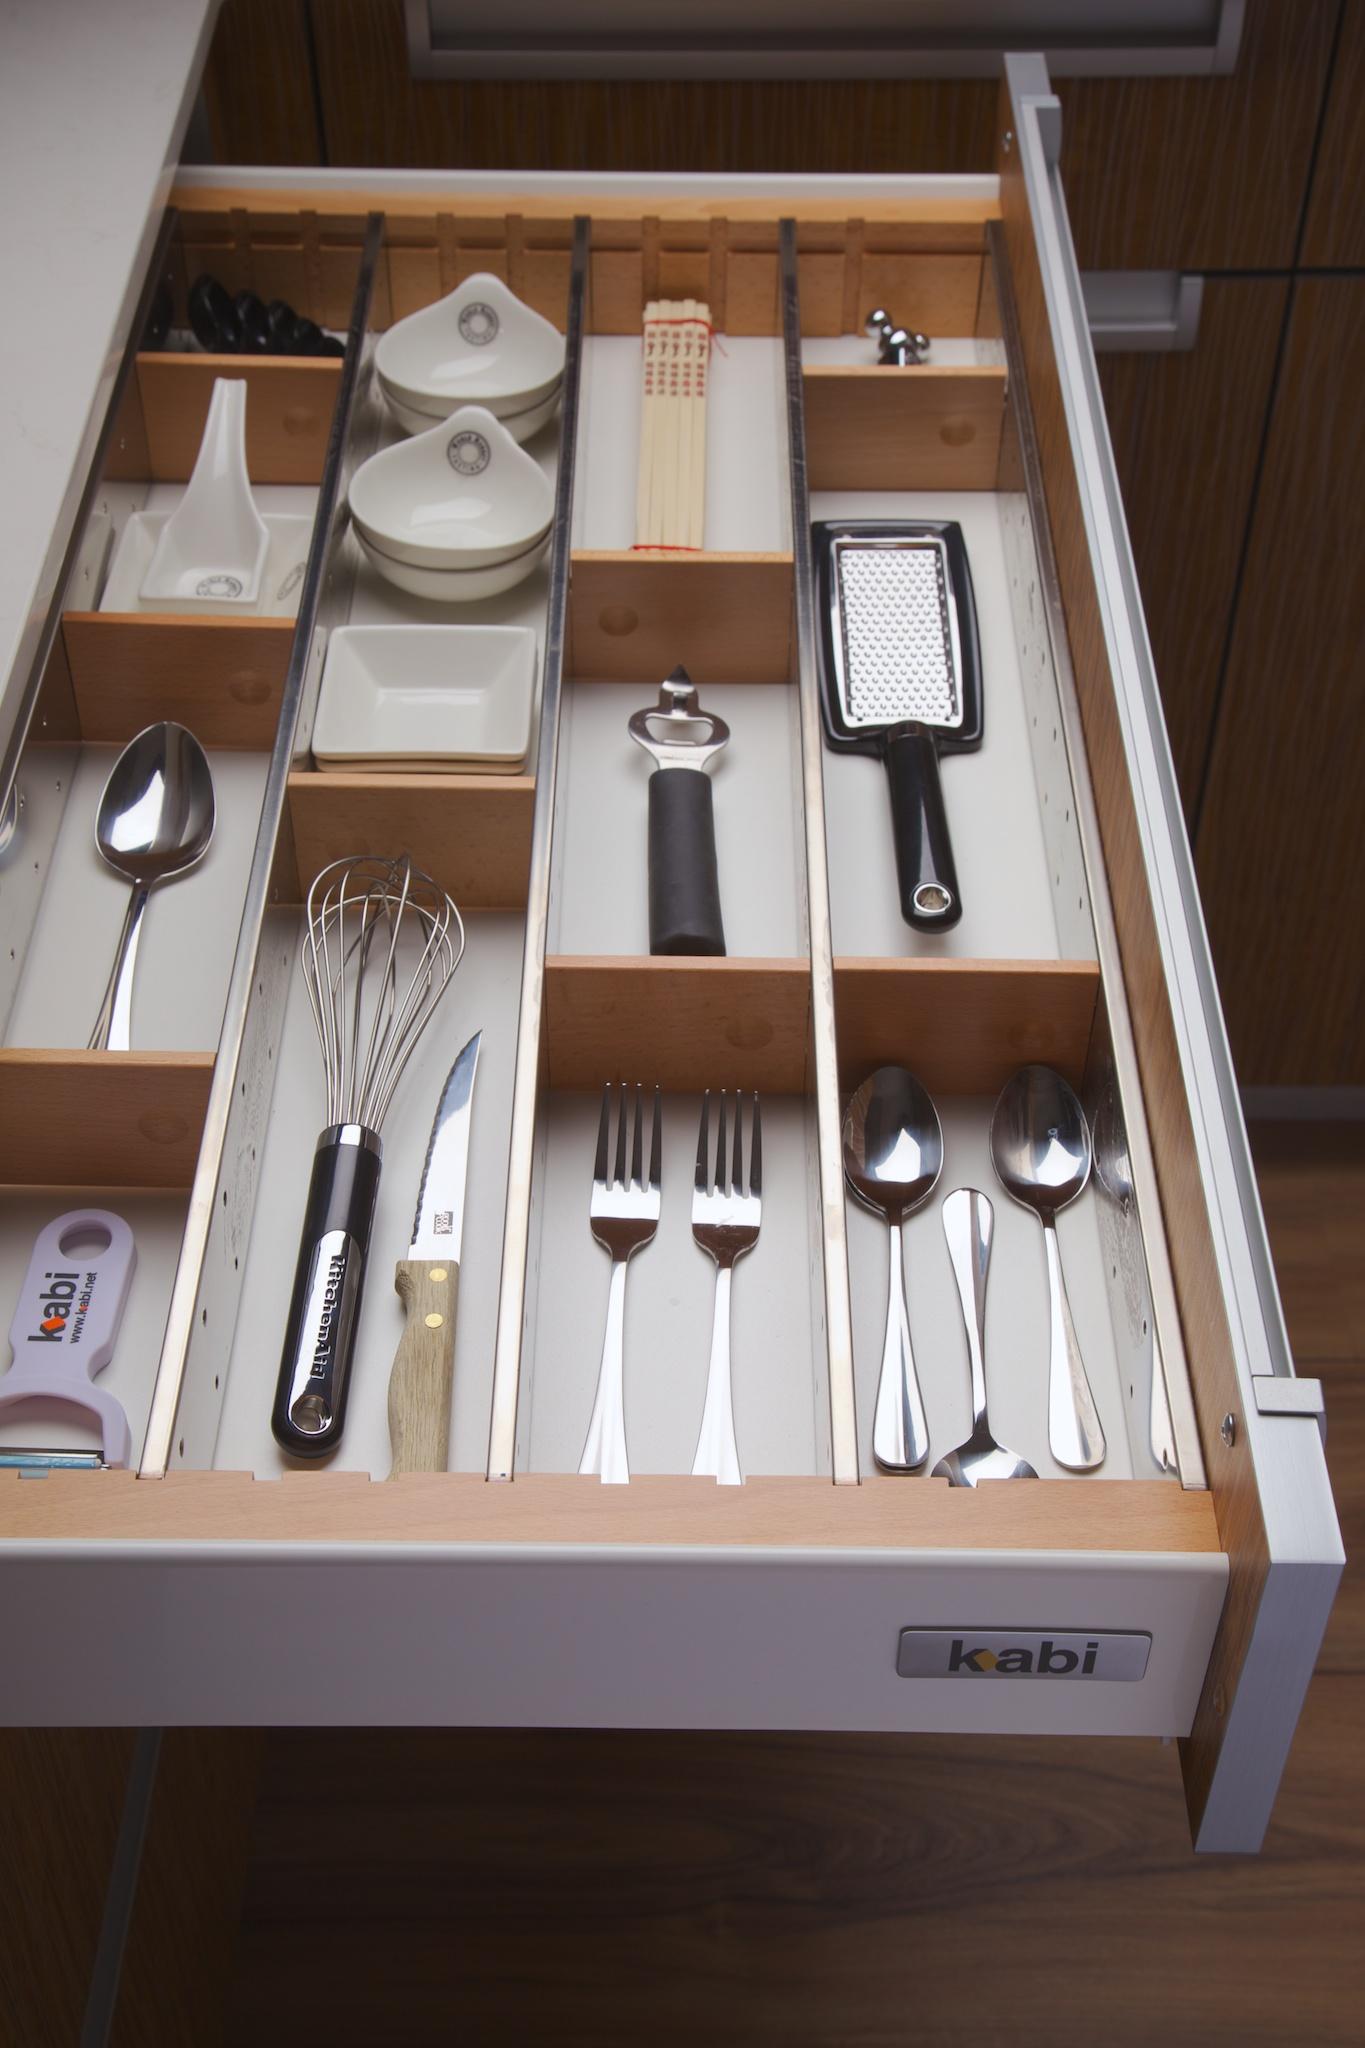 showroom drawer misc items .jpg